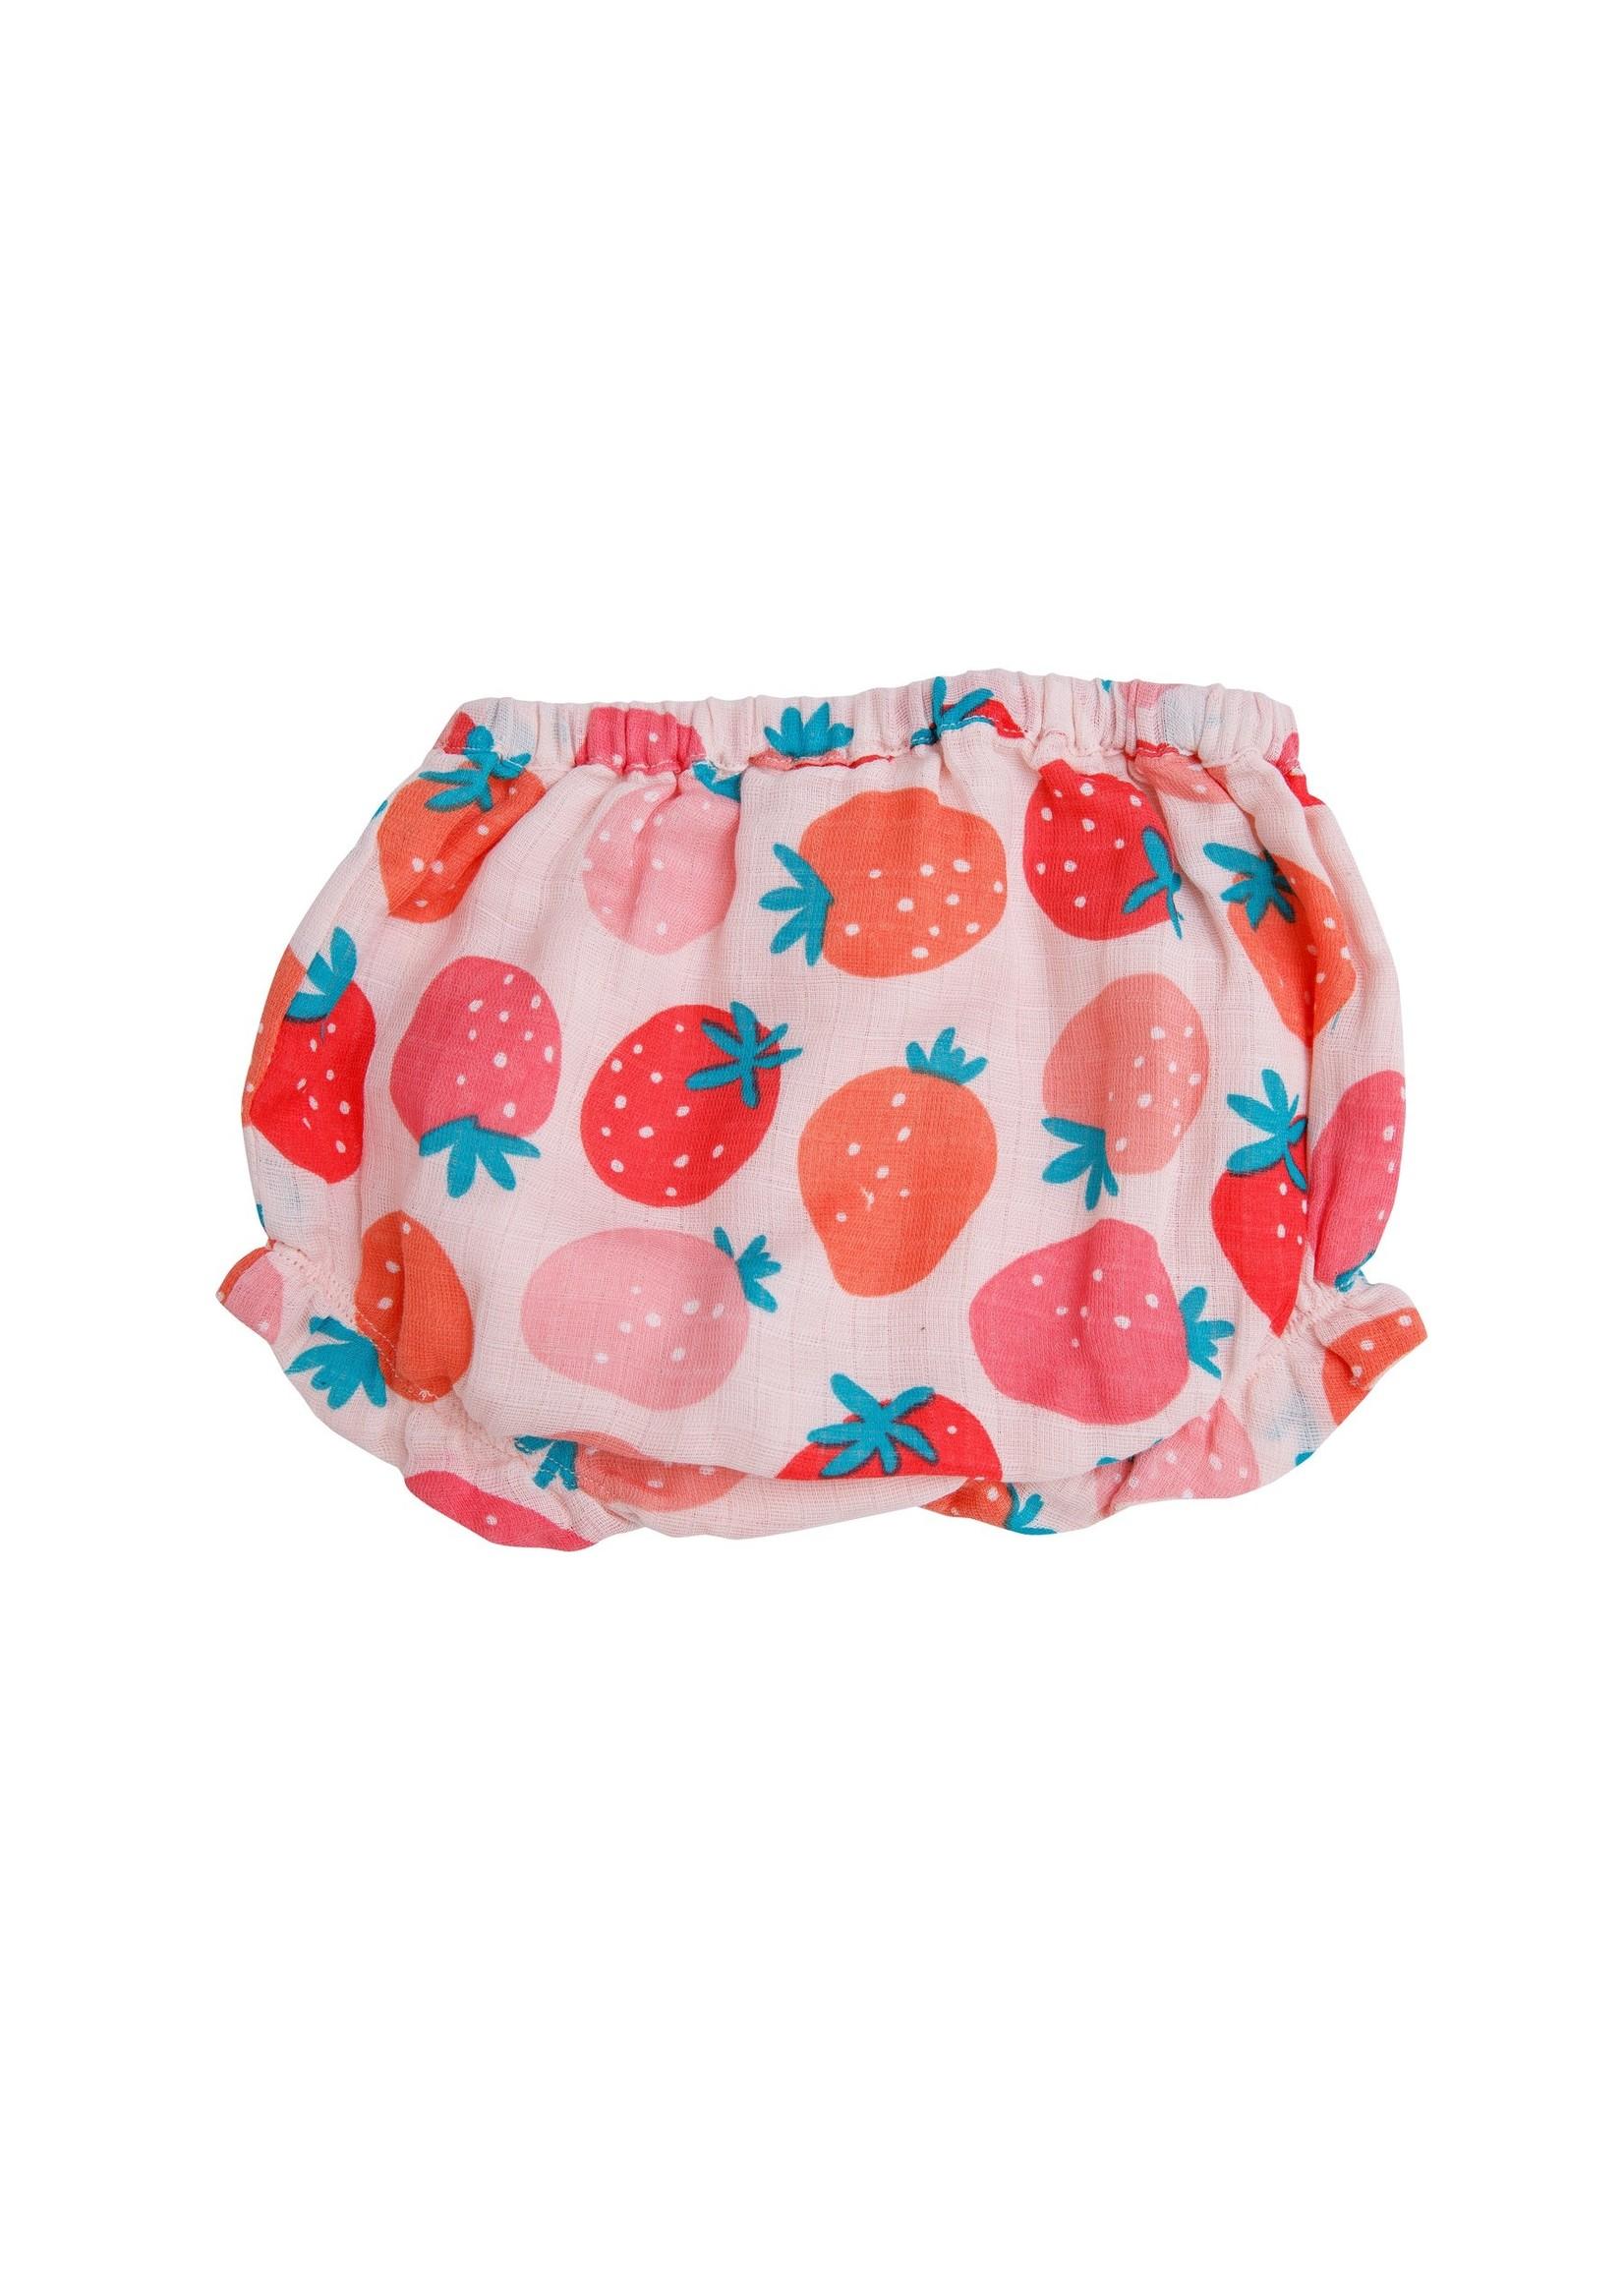 Angel Dear Strawberries Ruffle Top and Bloomer